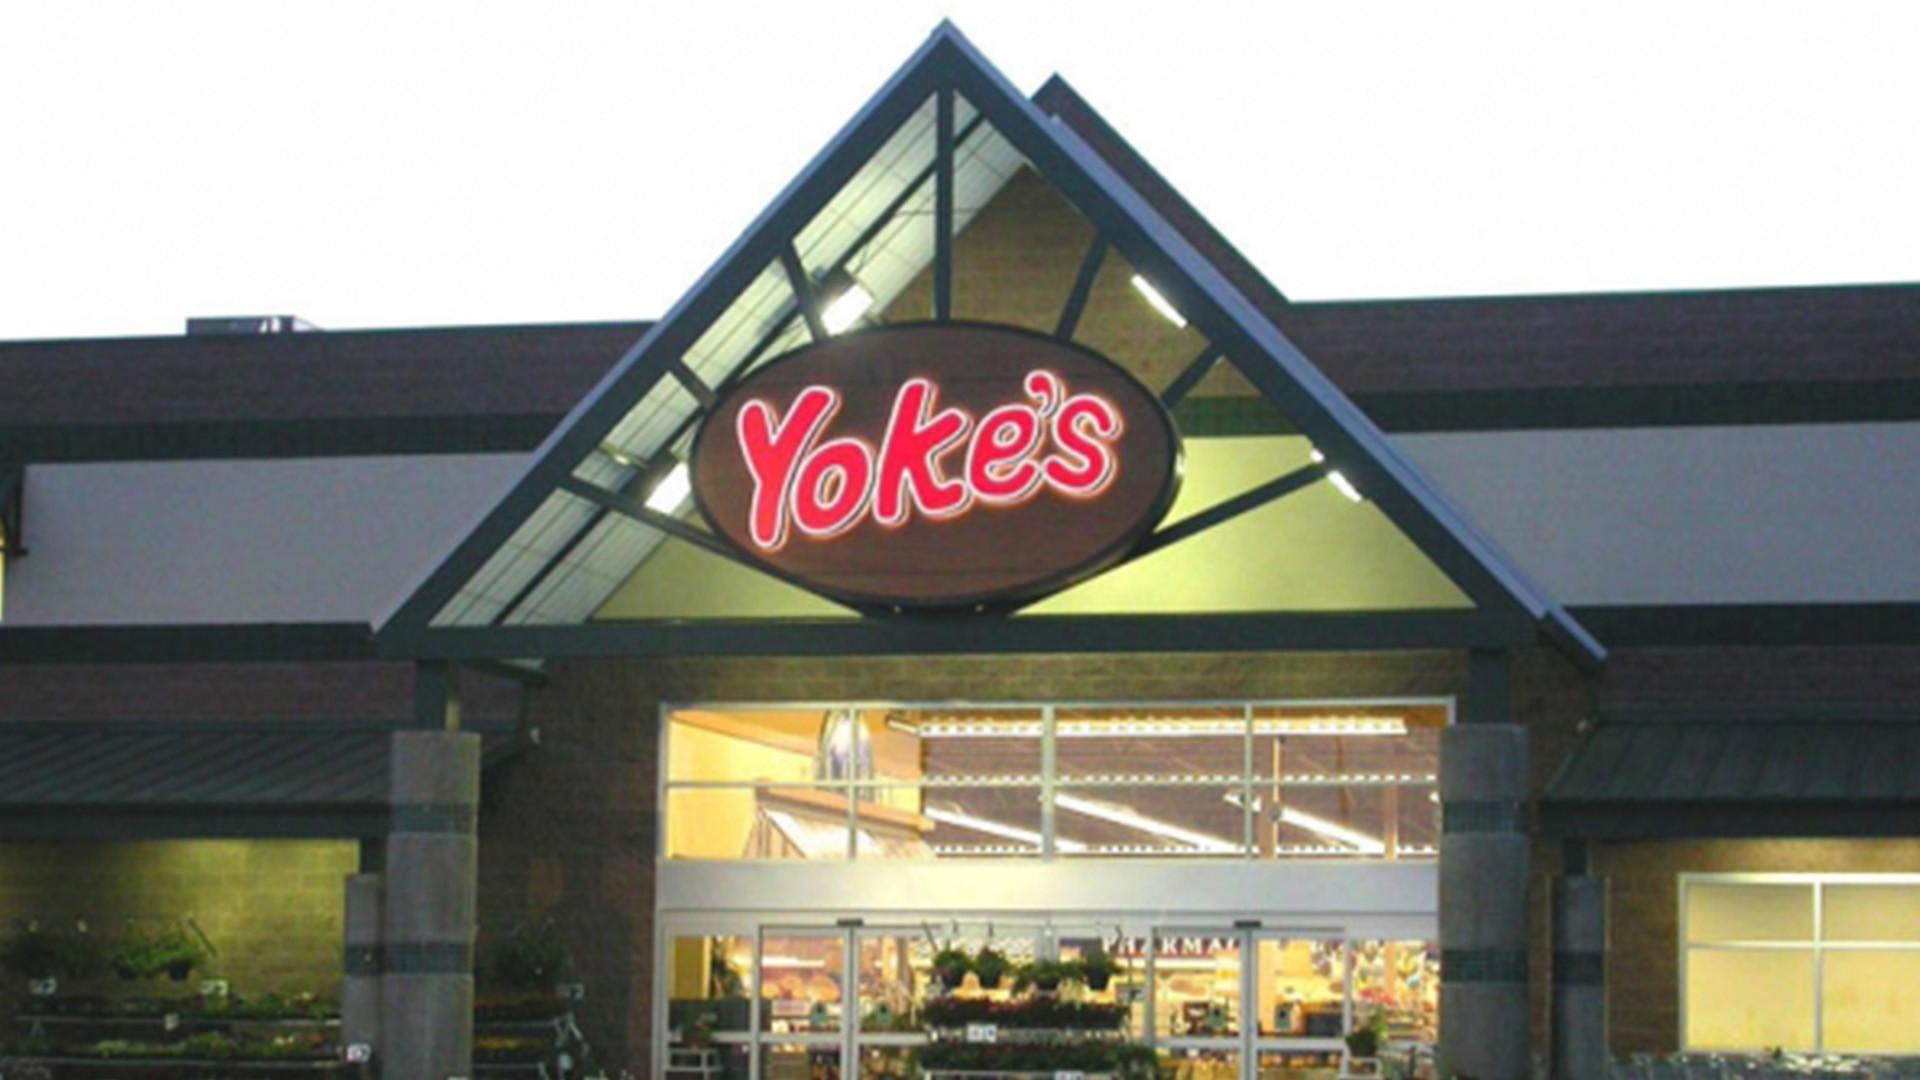 yokes - Retail